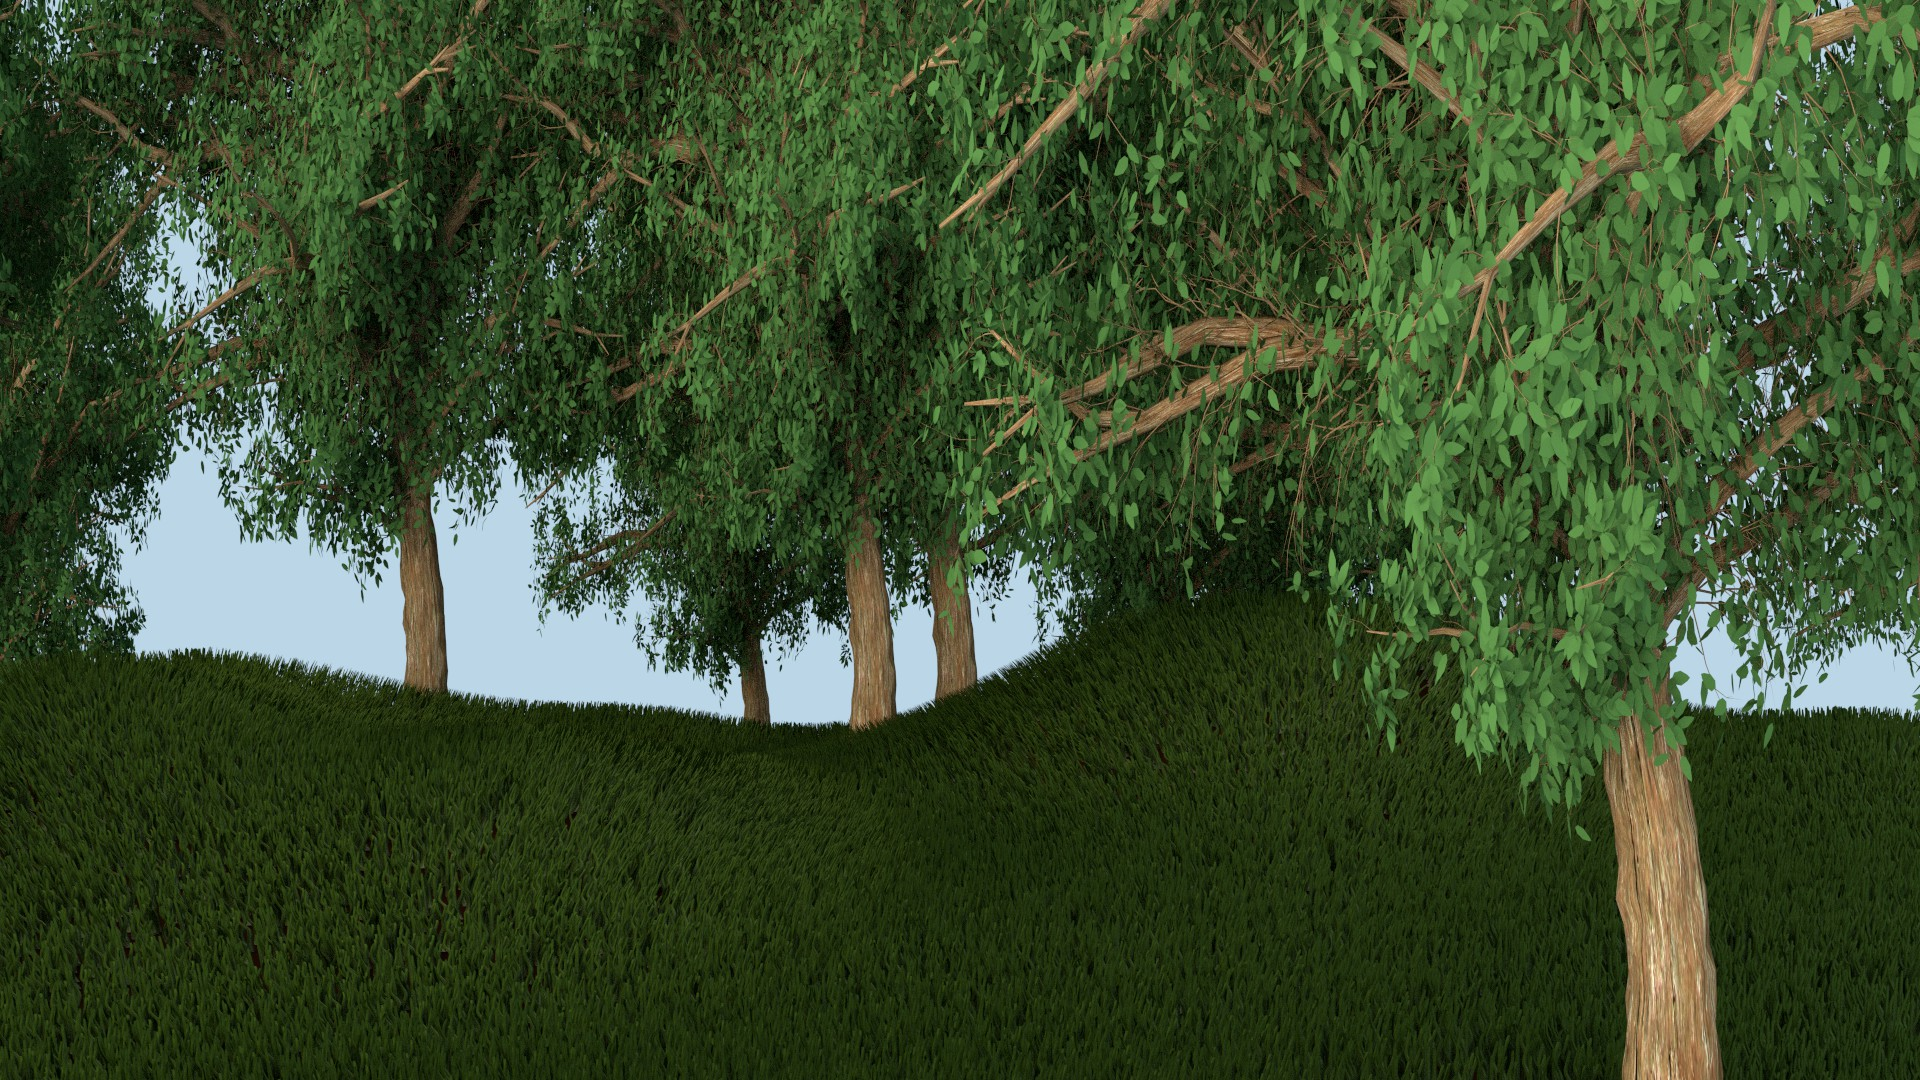 Grassy Hill 2